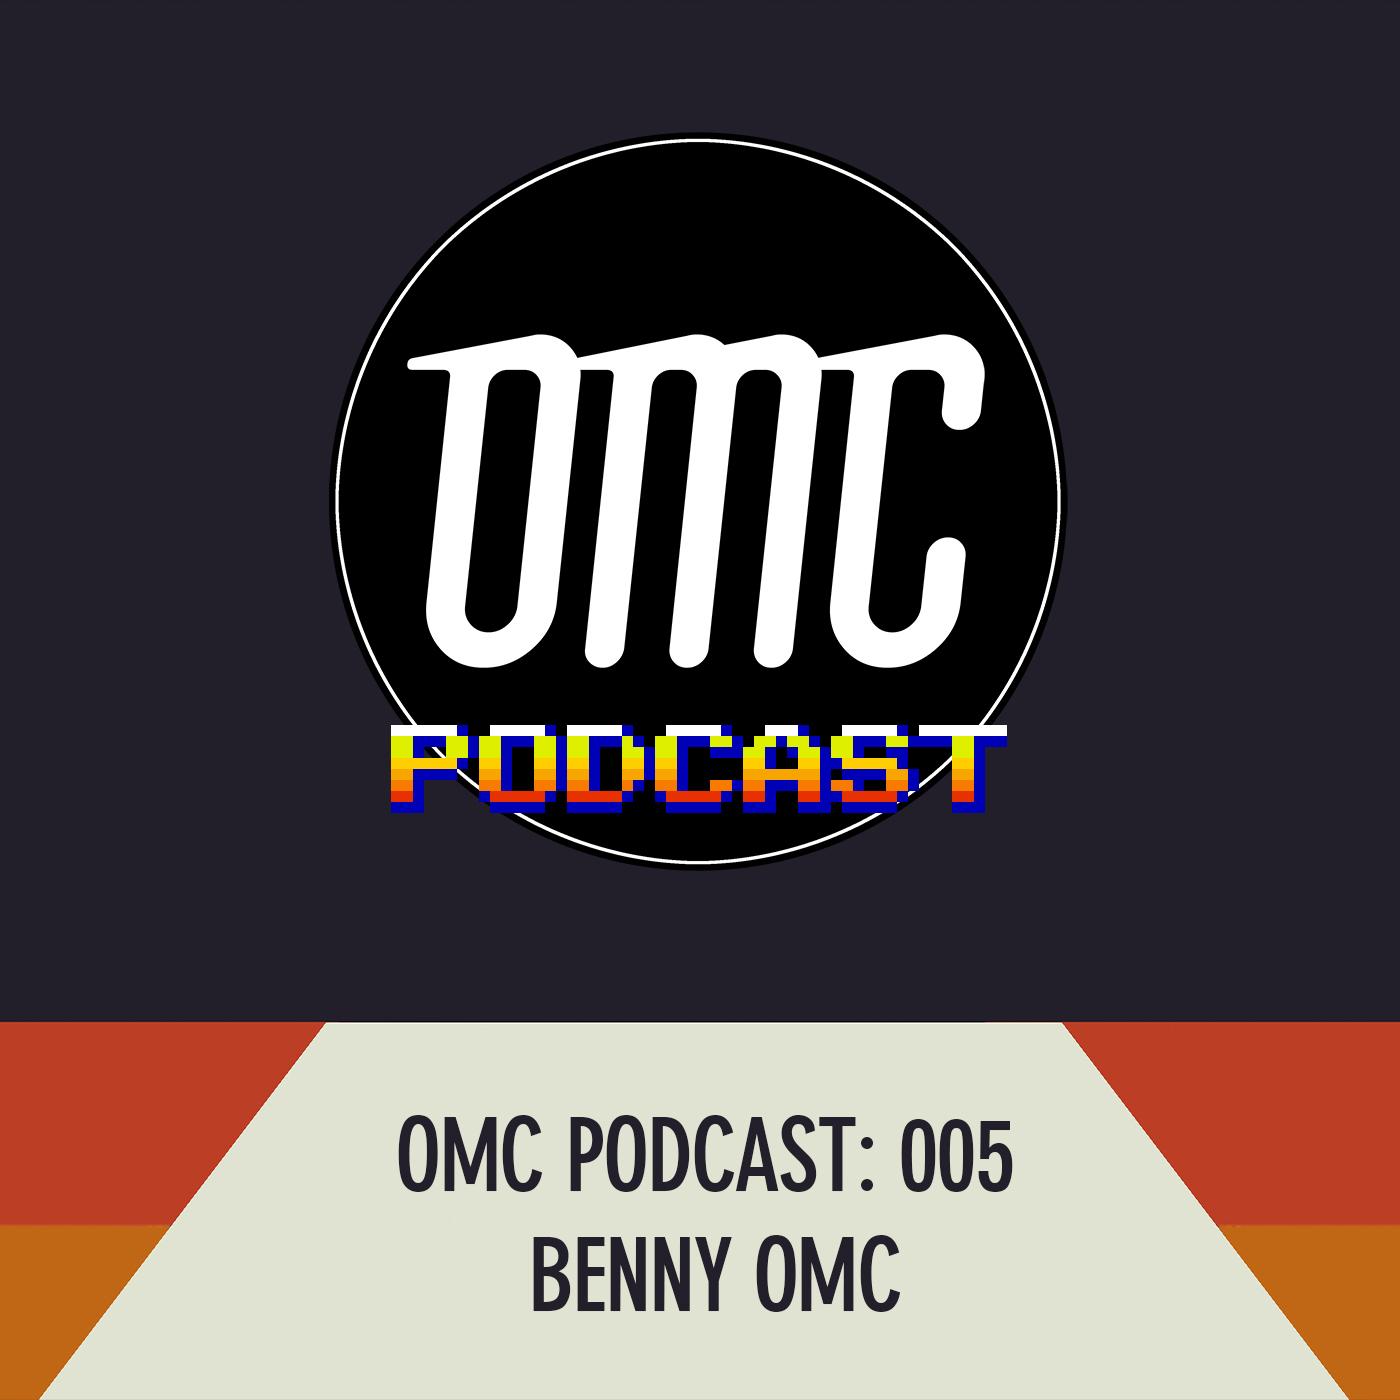 OMC Podcast 005: Benny OMC show art